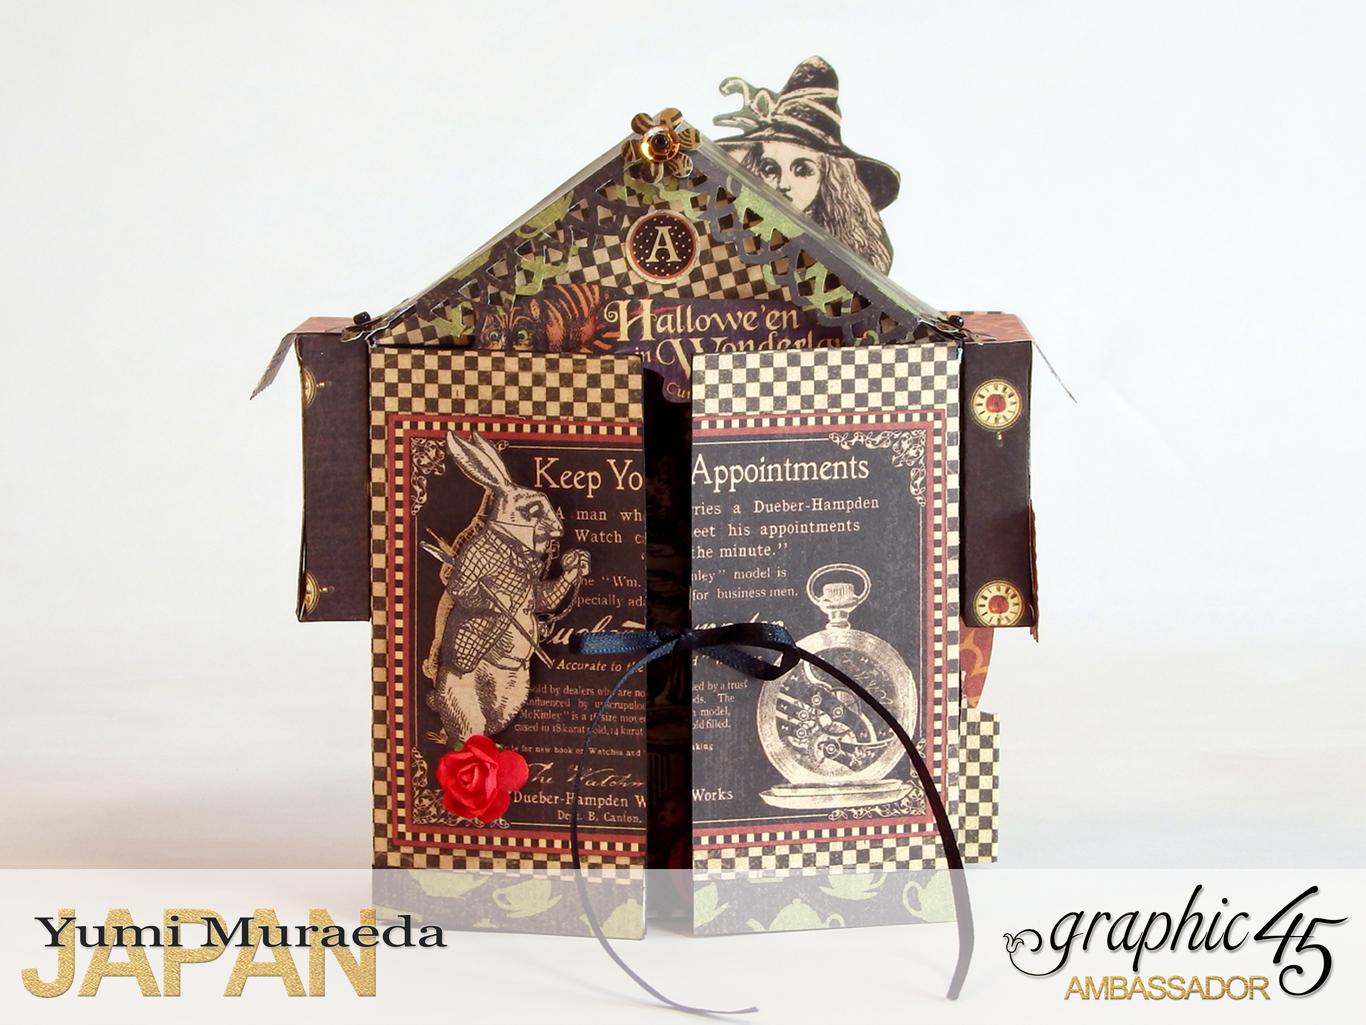 1 Alices Odd Tea HouseHalloween Wonderlandby Yumi MuraedaProduct by Graphic 45